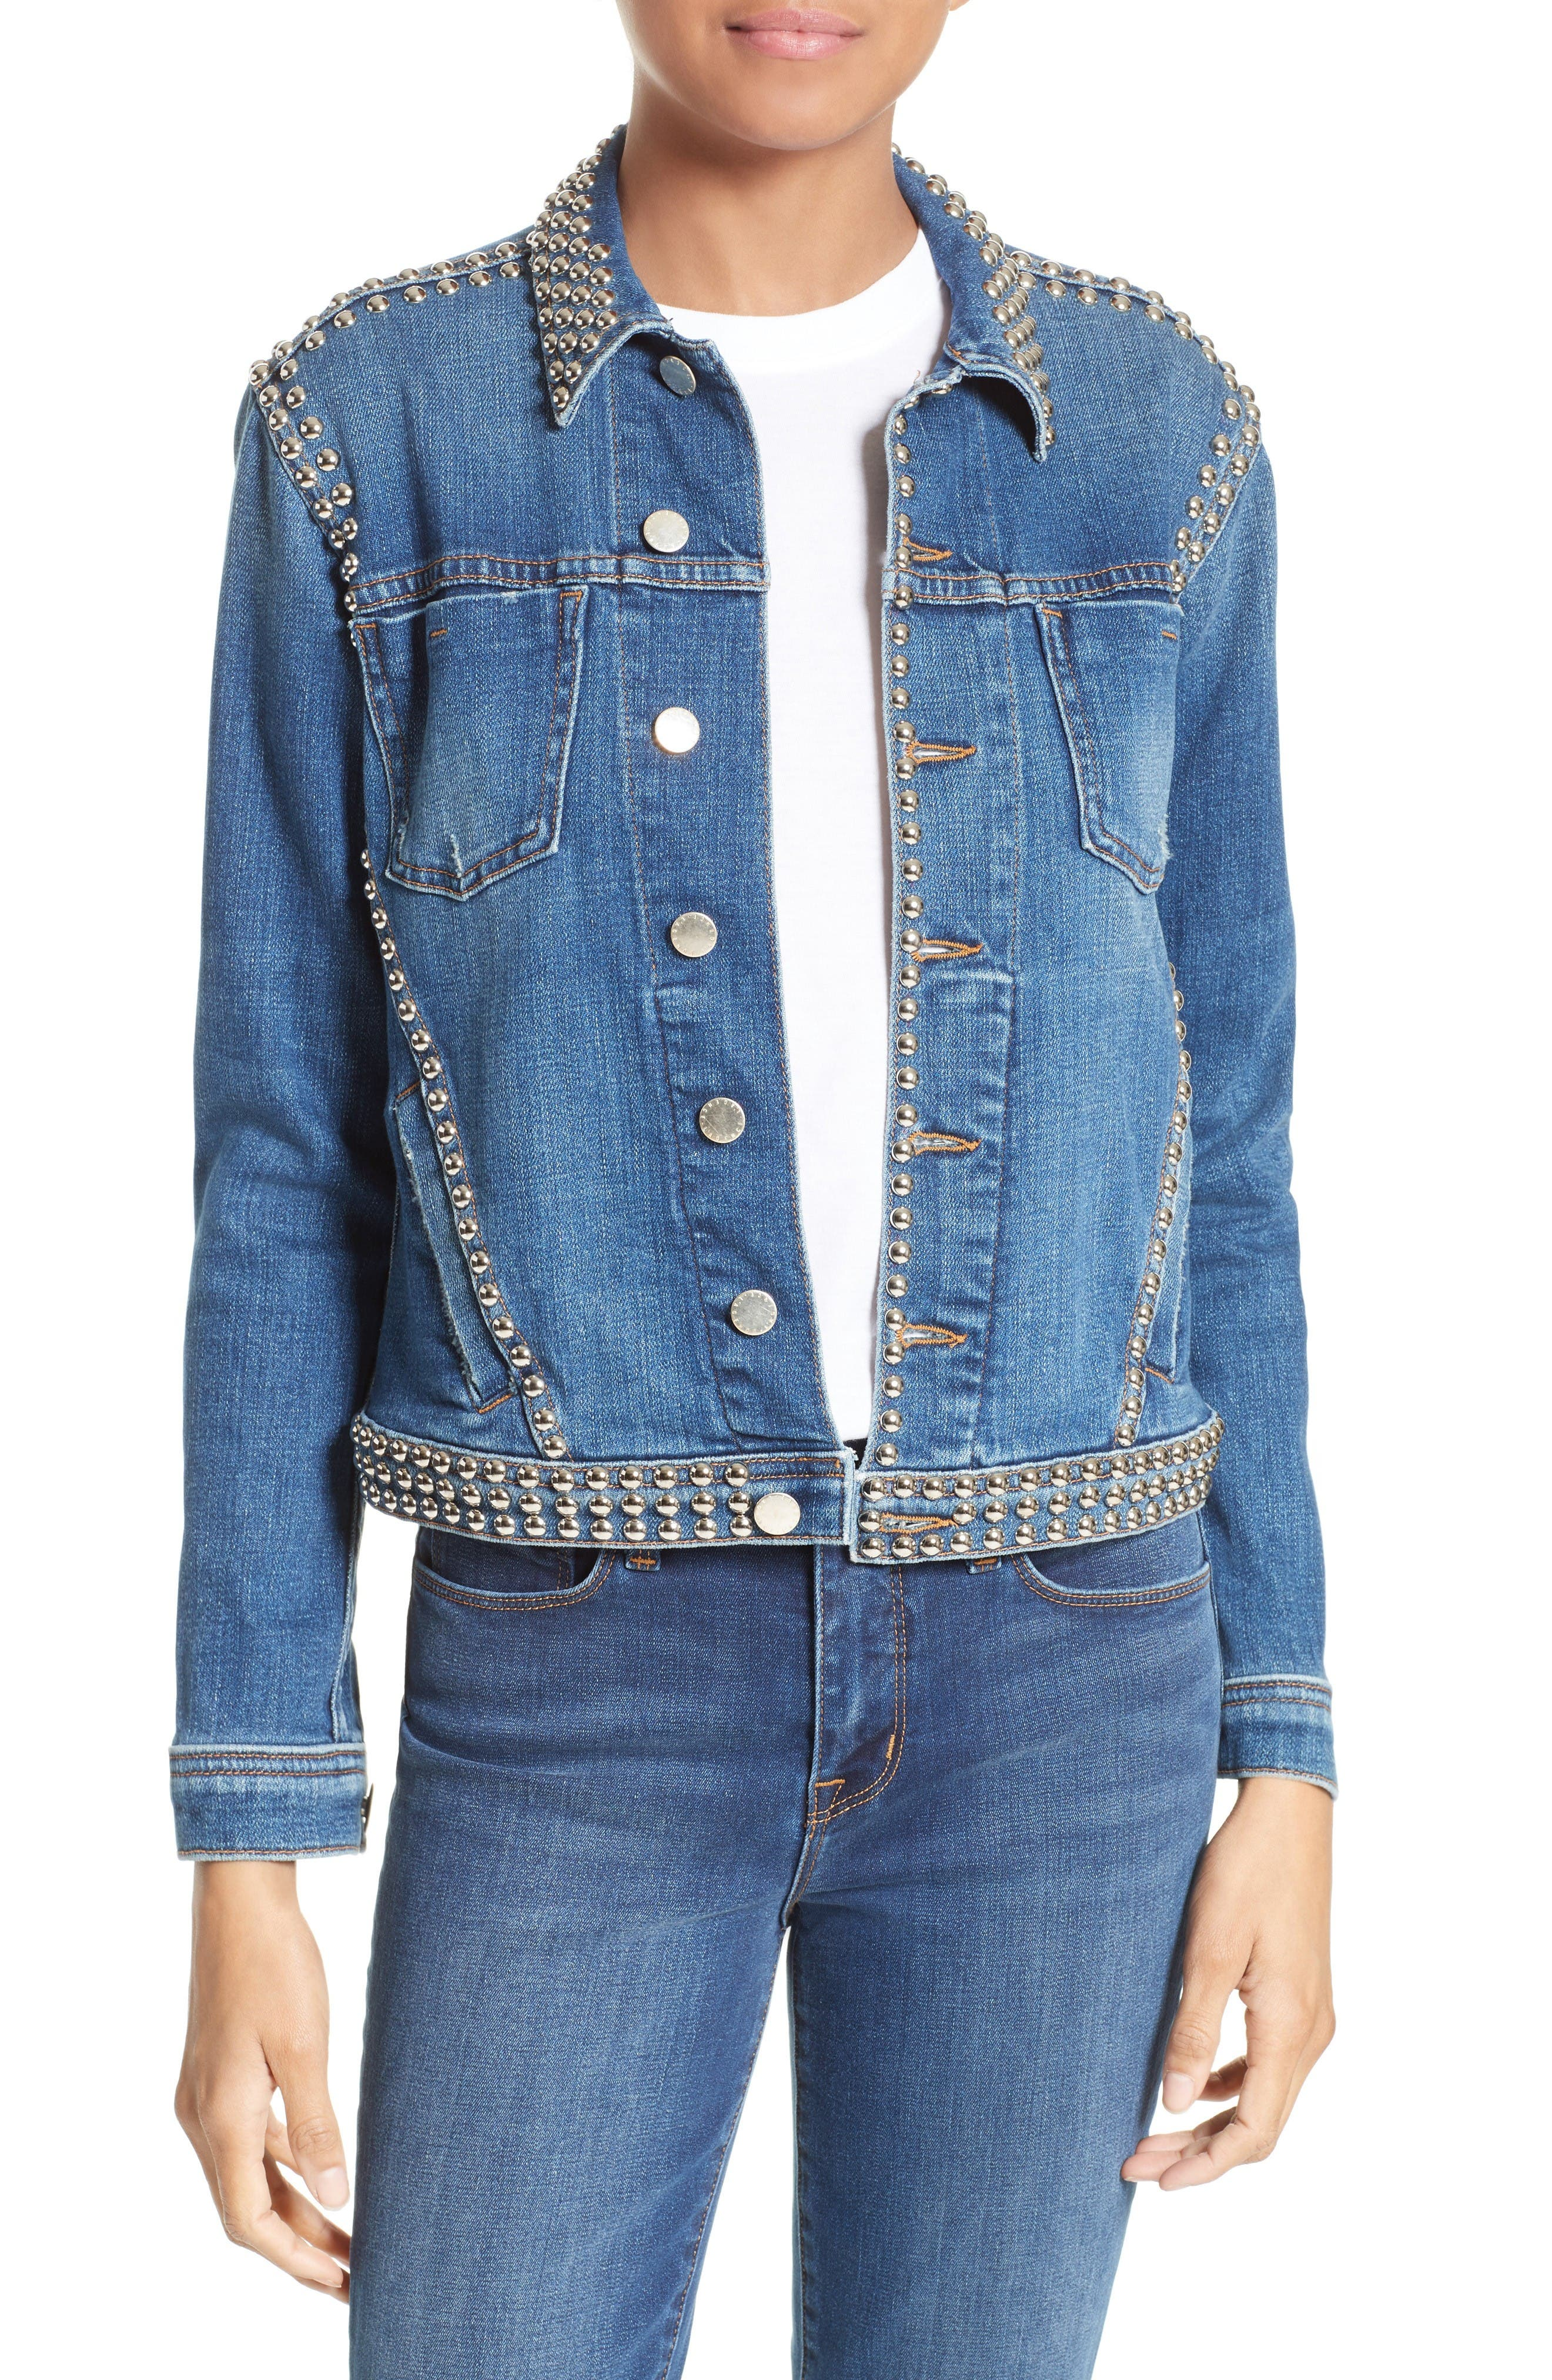 L'AGENCE Studded Denim Jacket